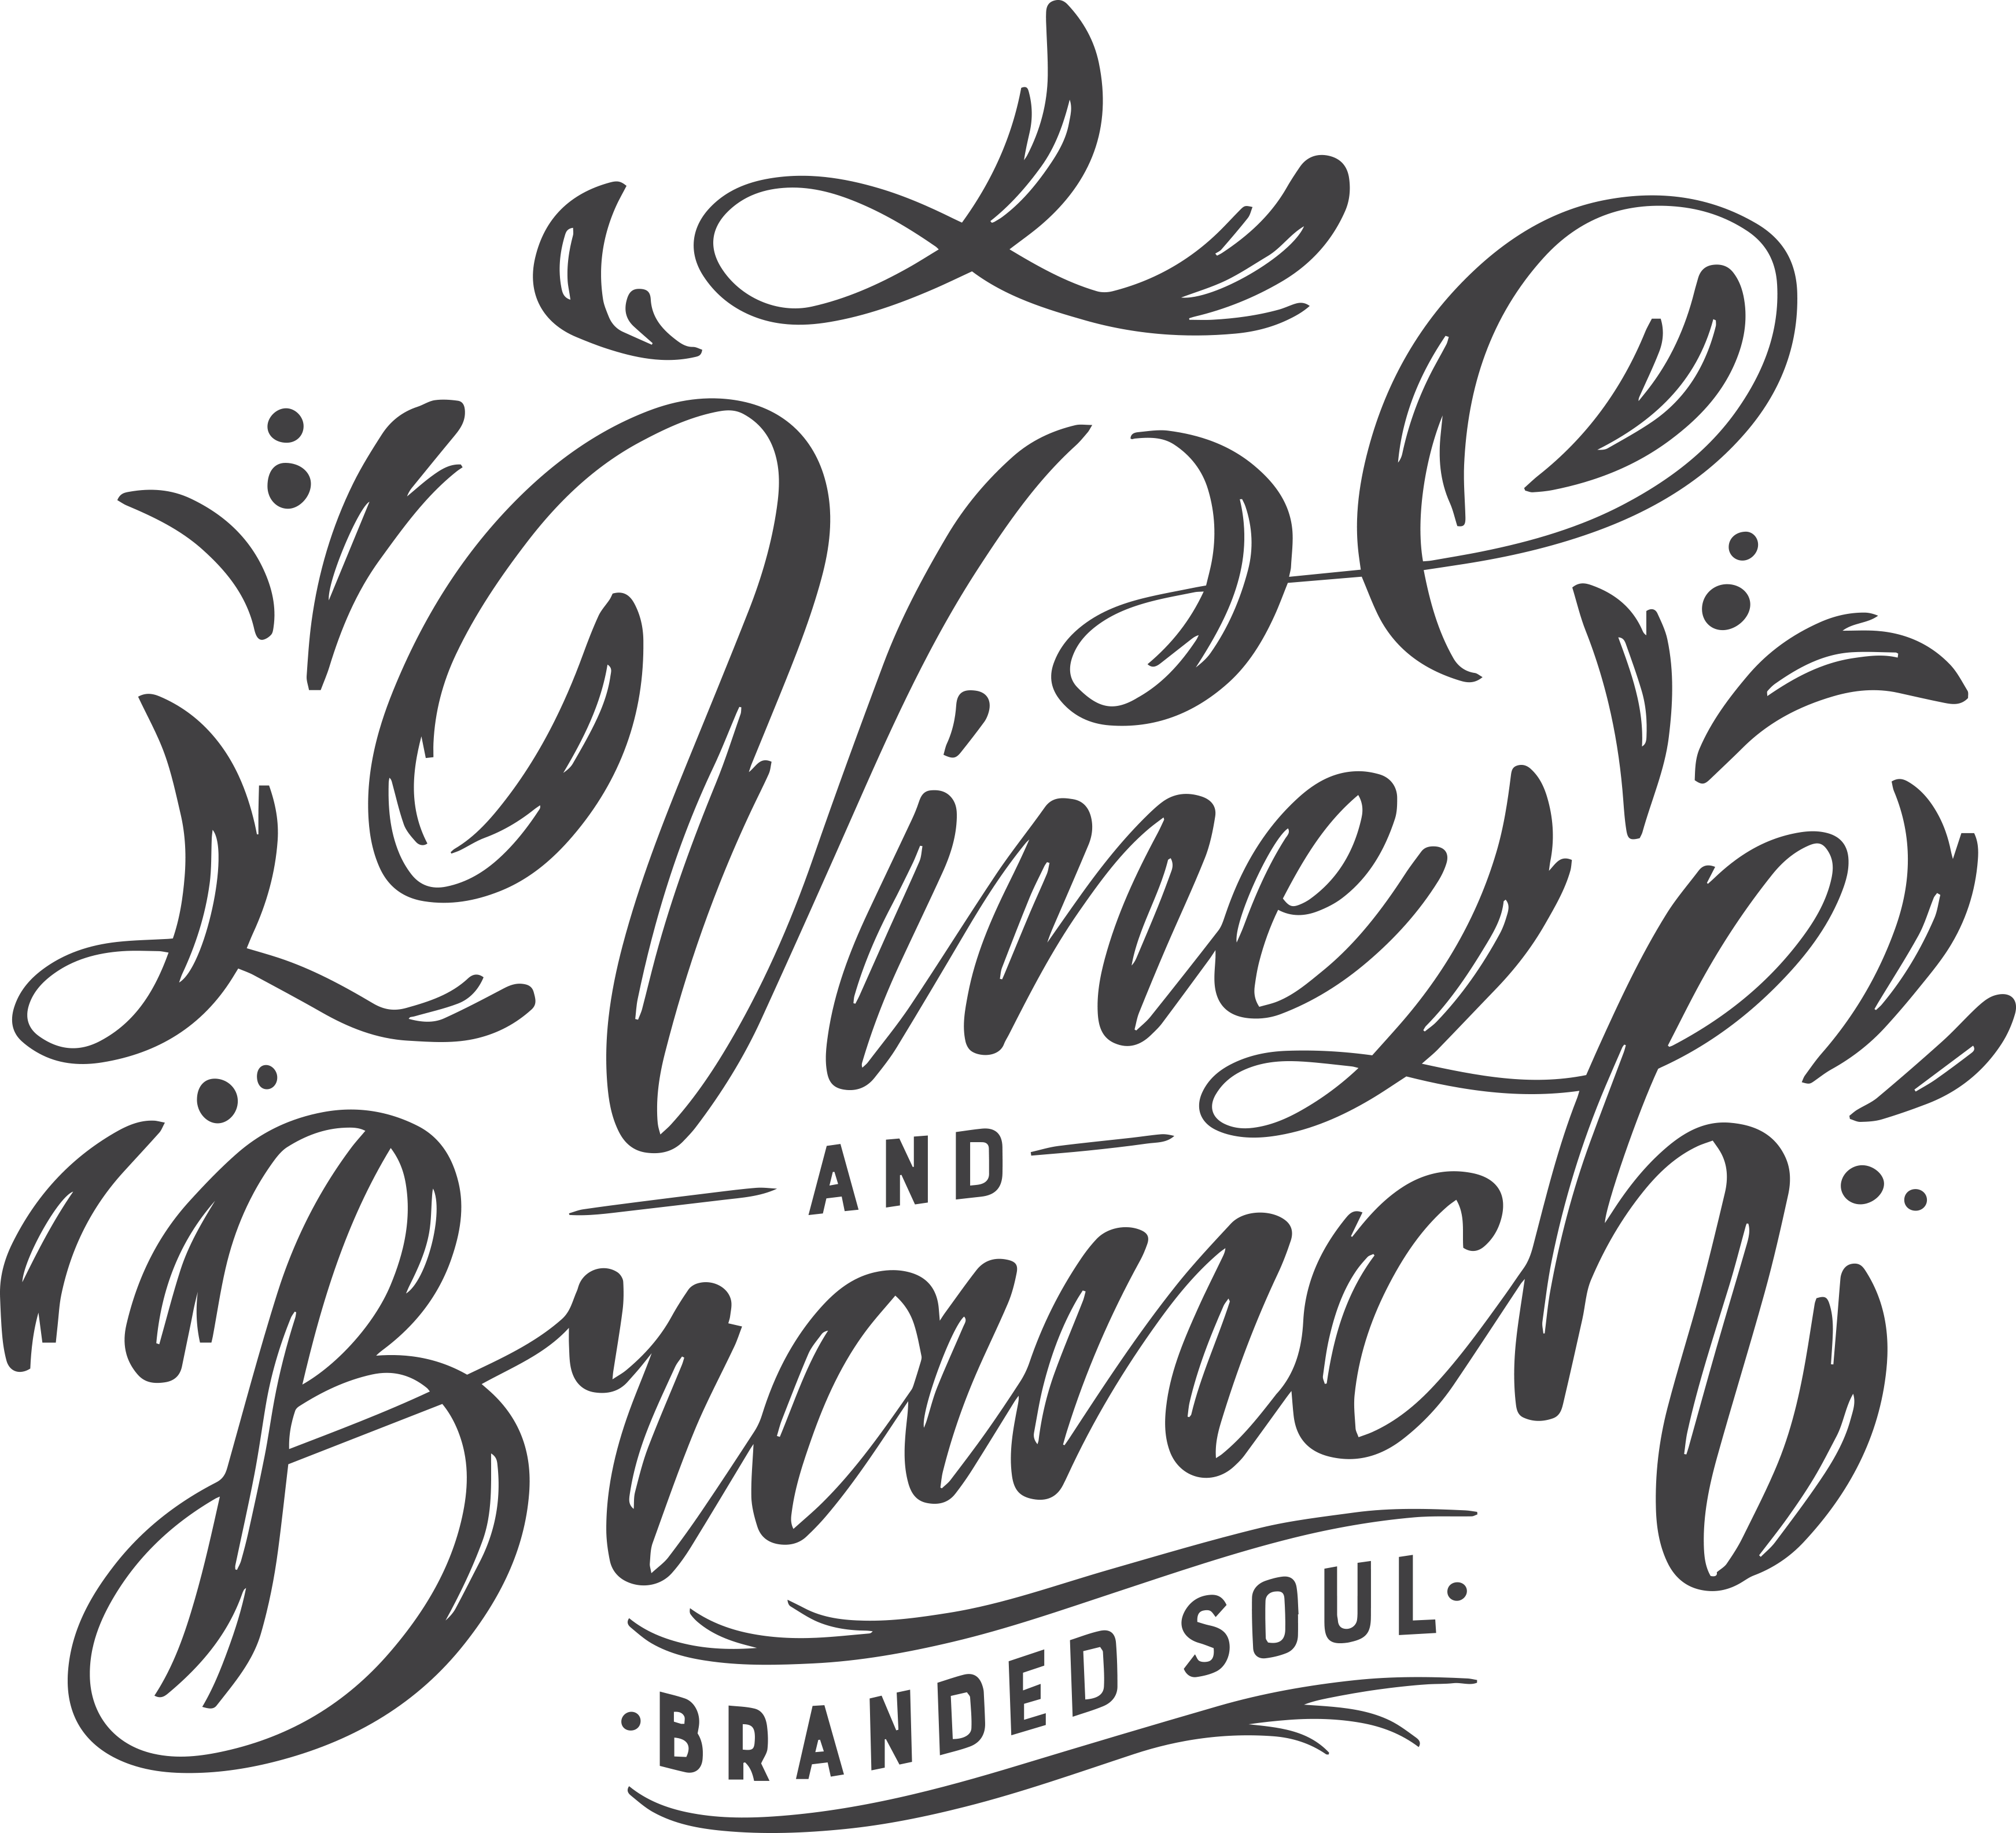 Vine and Branch Tshirt Design